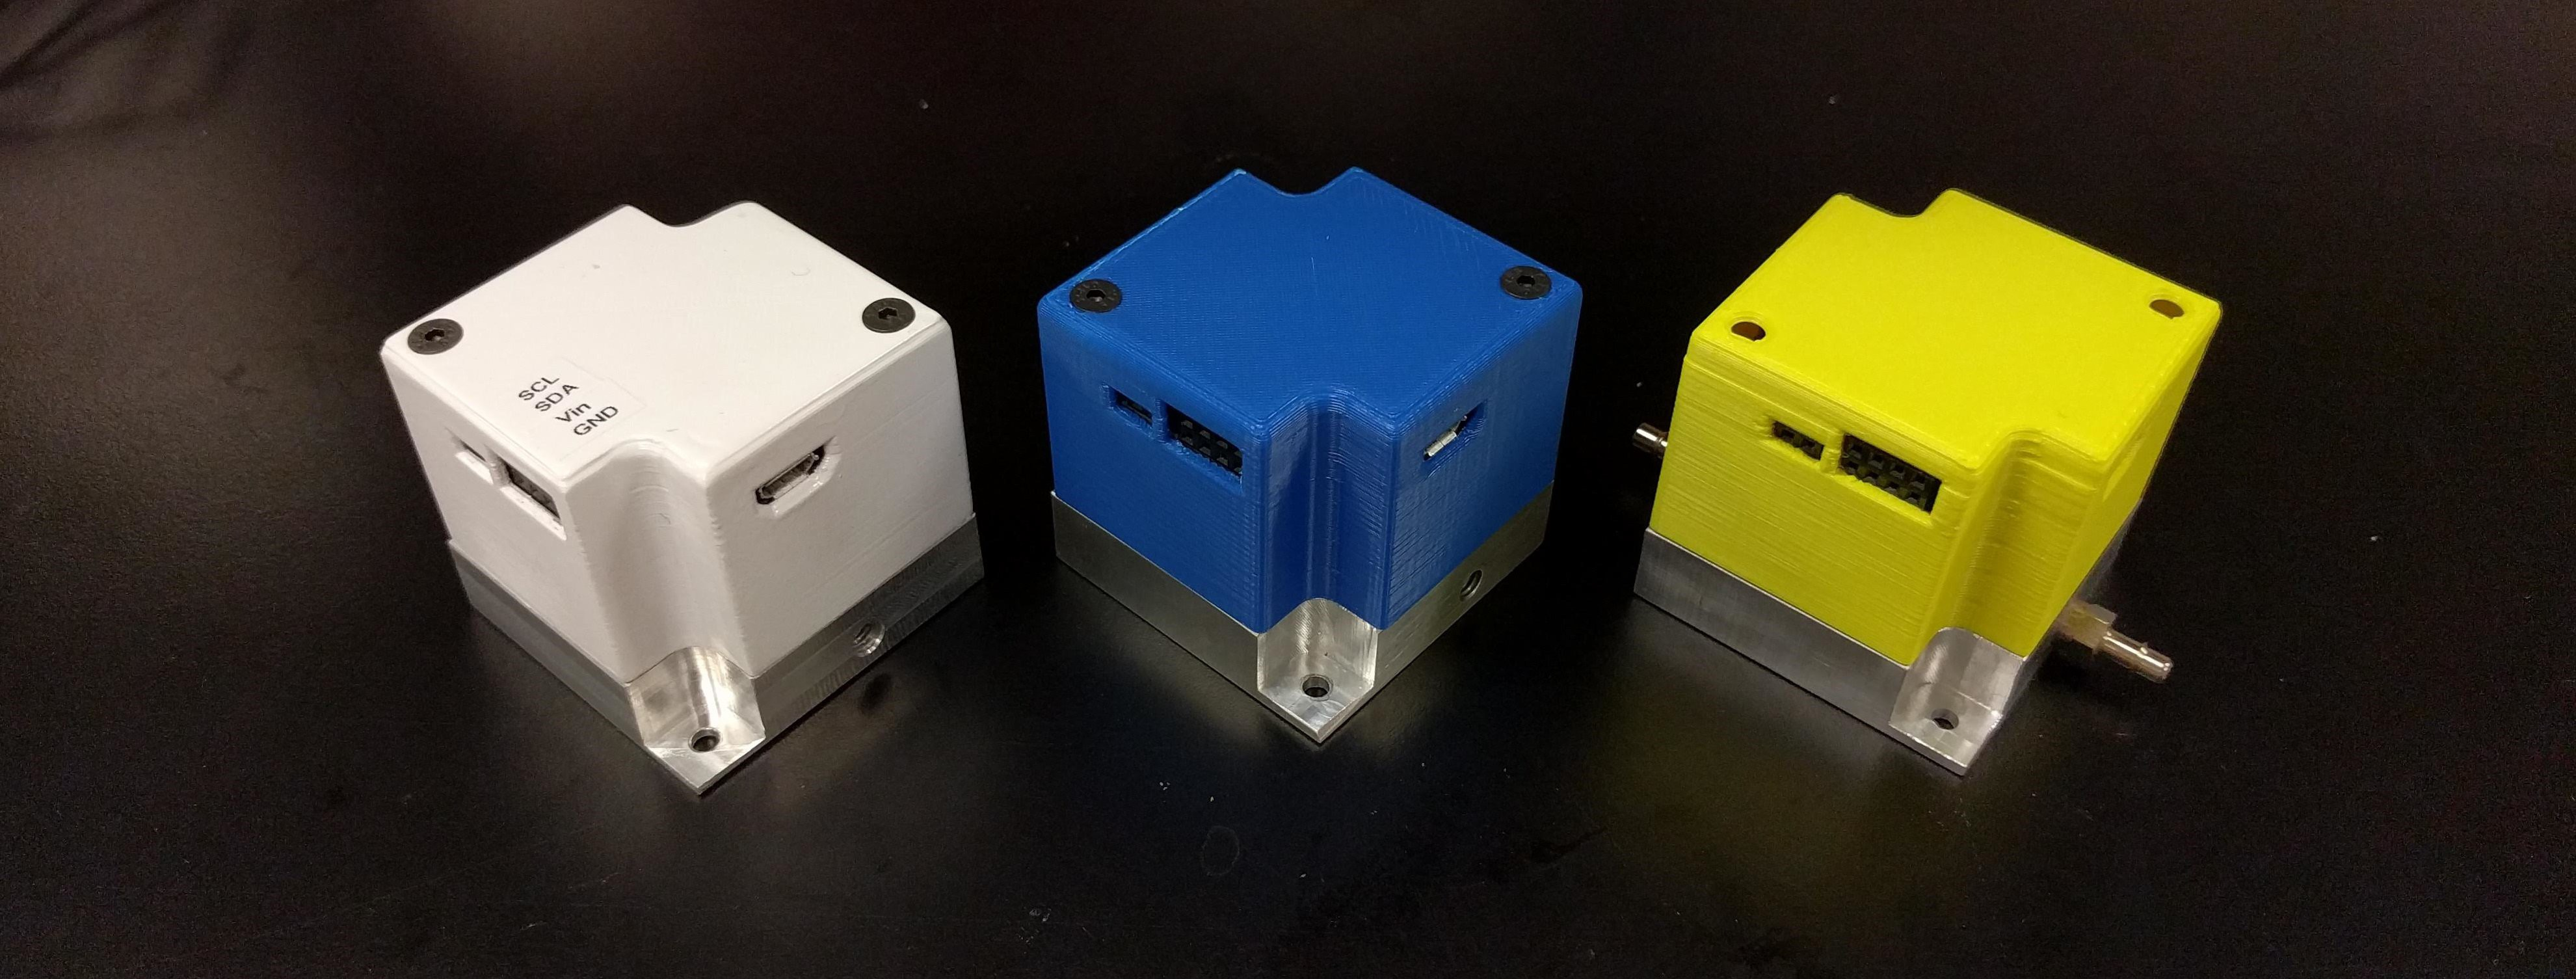 Project | Electronic pressure regulator | Hackaday io